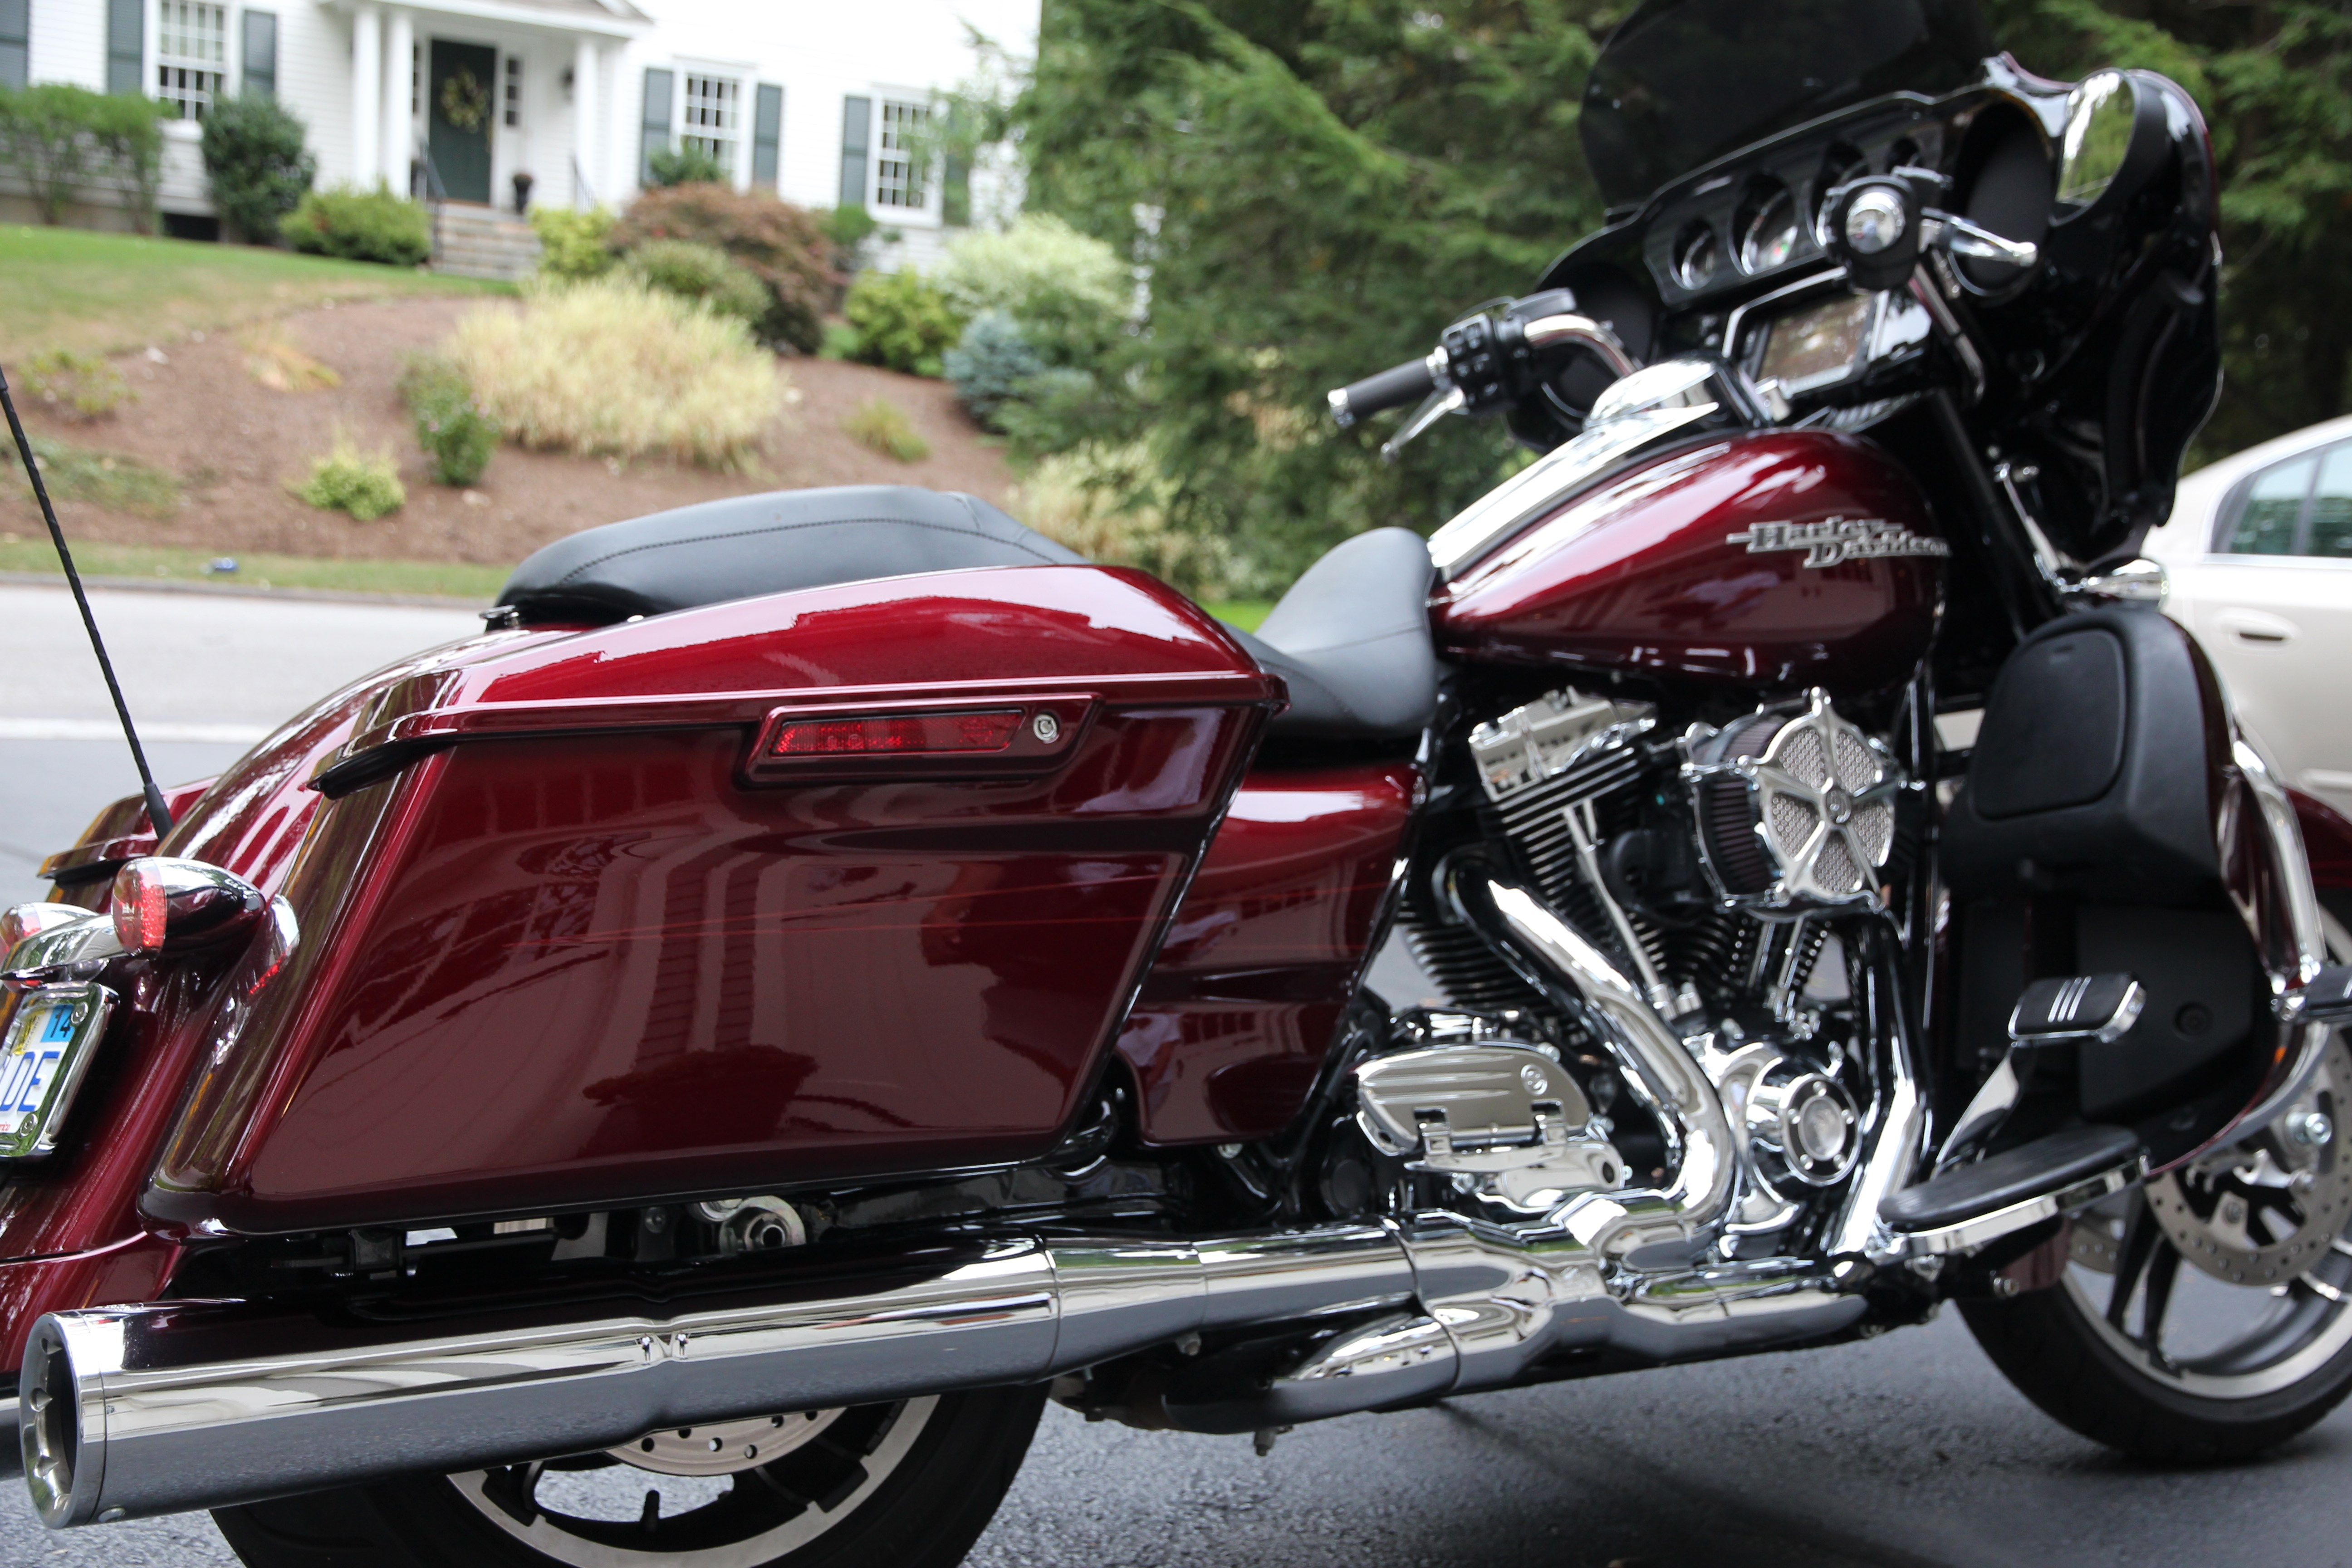 2014 Harley Davidson 174 Flhxs Street Glide 174 Special